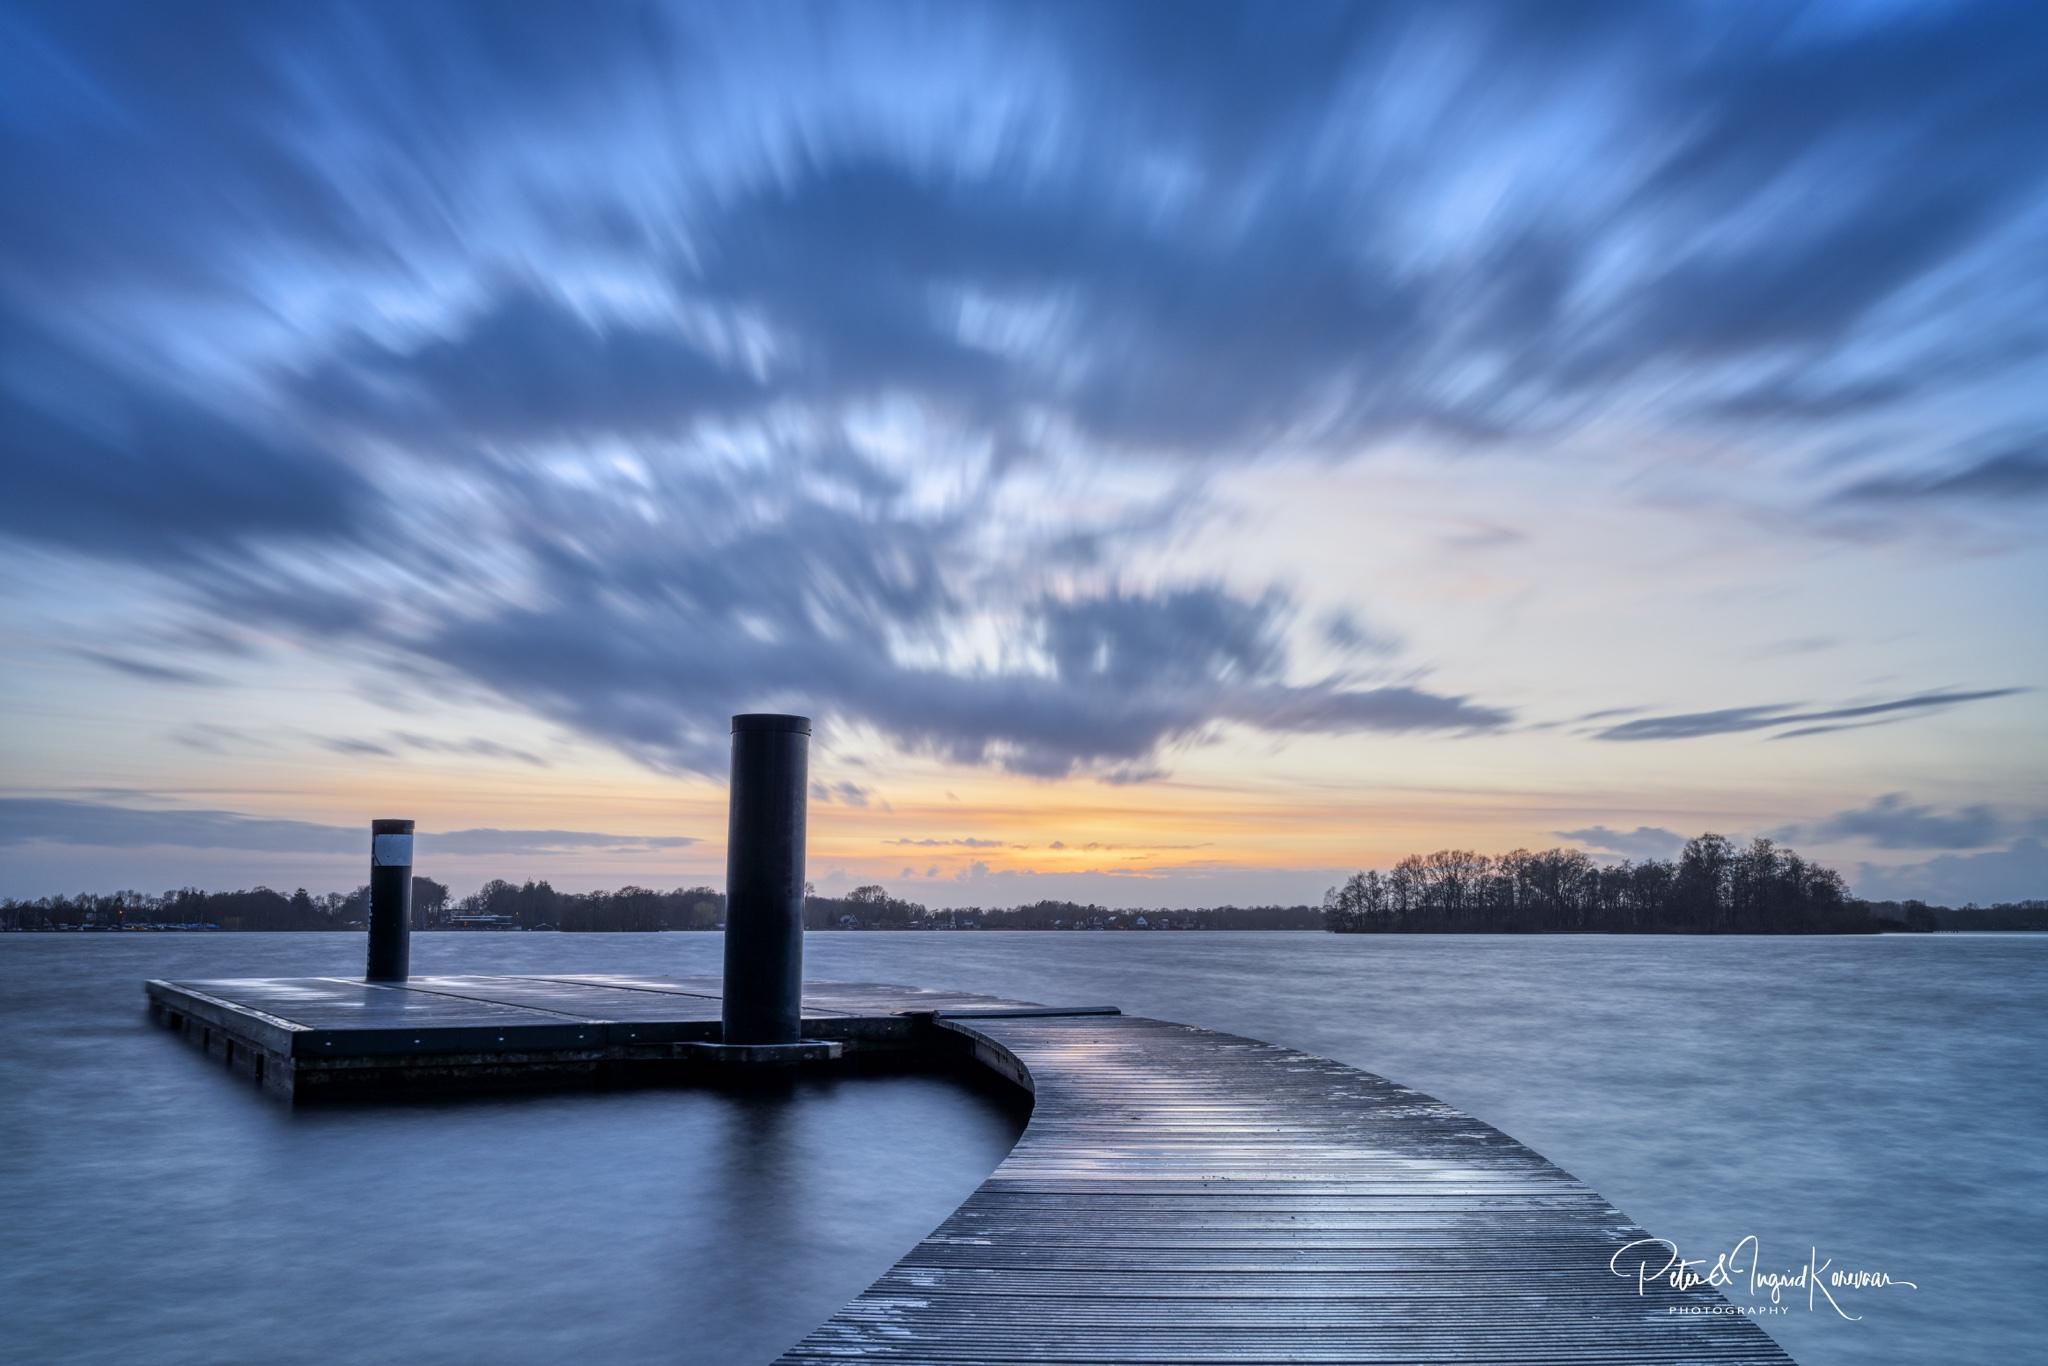 Steiger Paterswoldsemeer, Netherlands